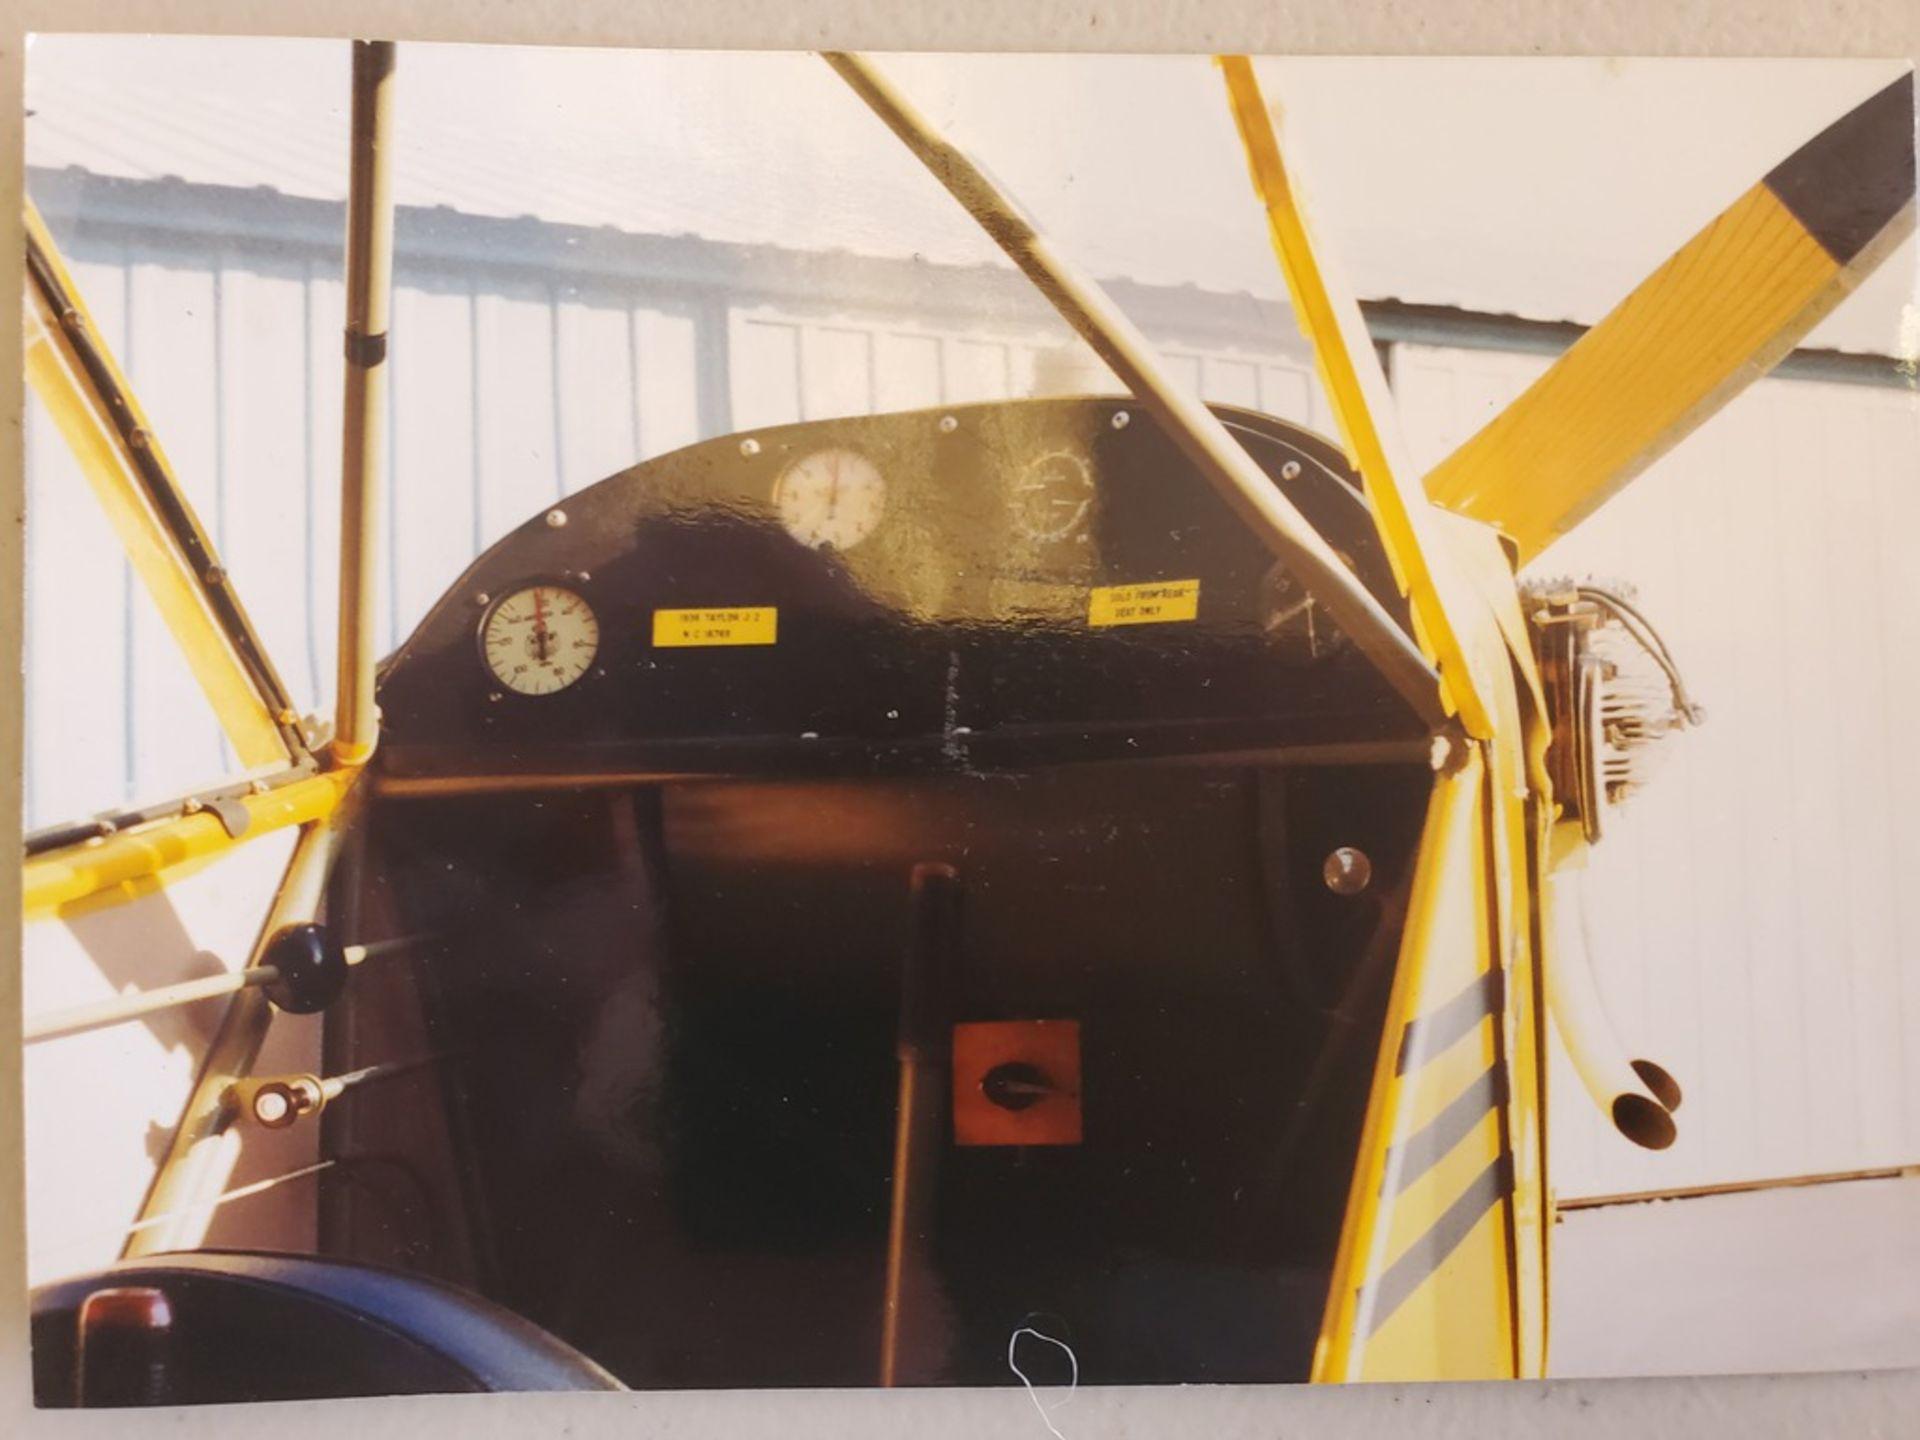 1936 TAYLOR/PIPER J2 CUB N16769 S/N 771 - Image 3 of 4